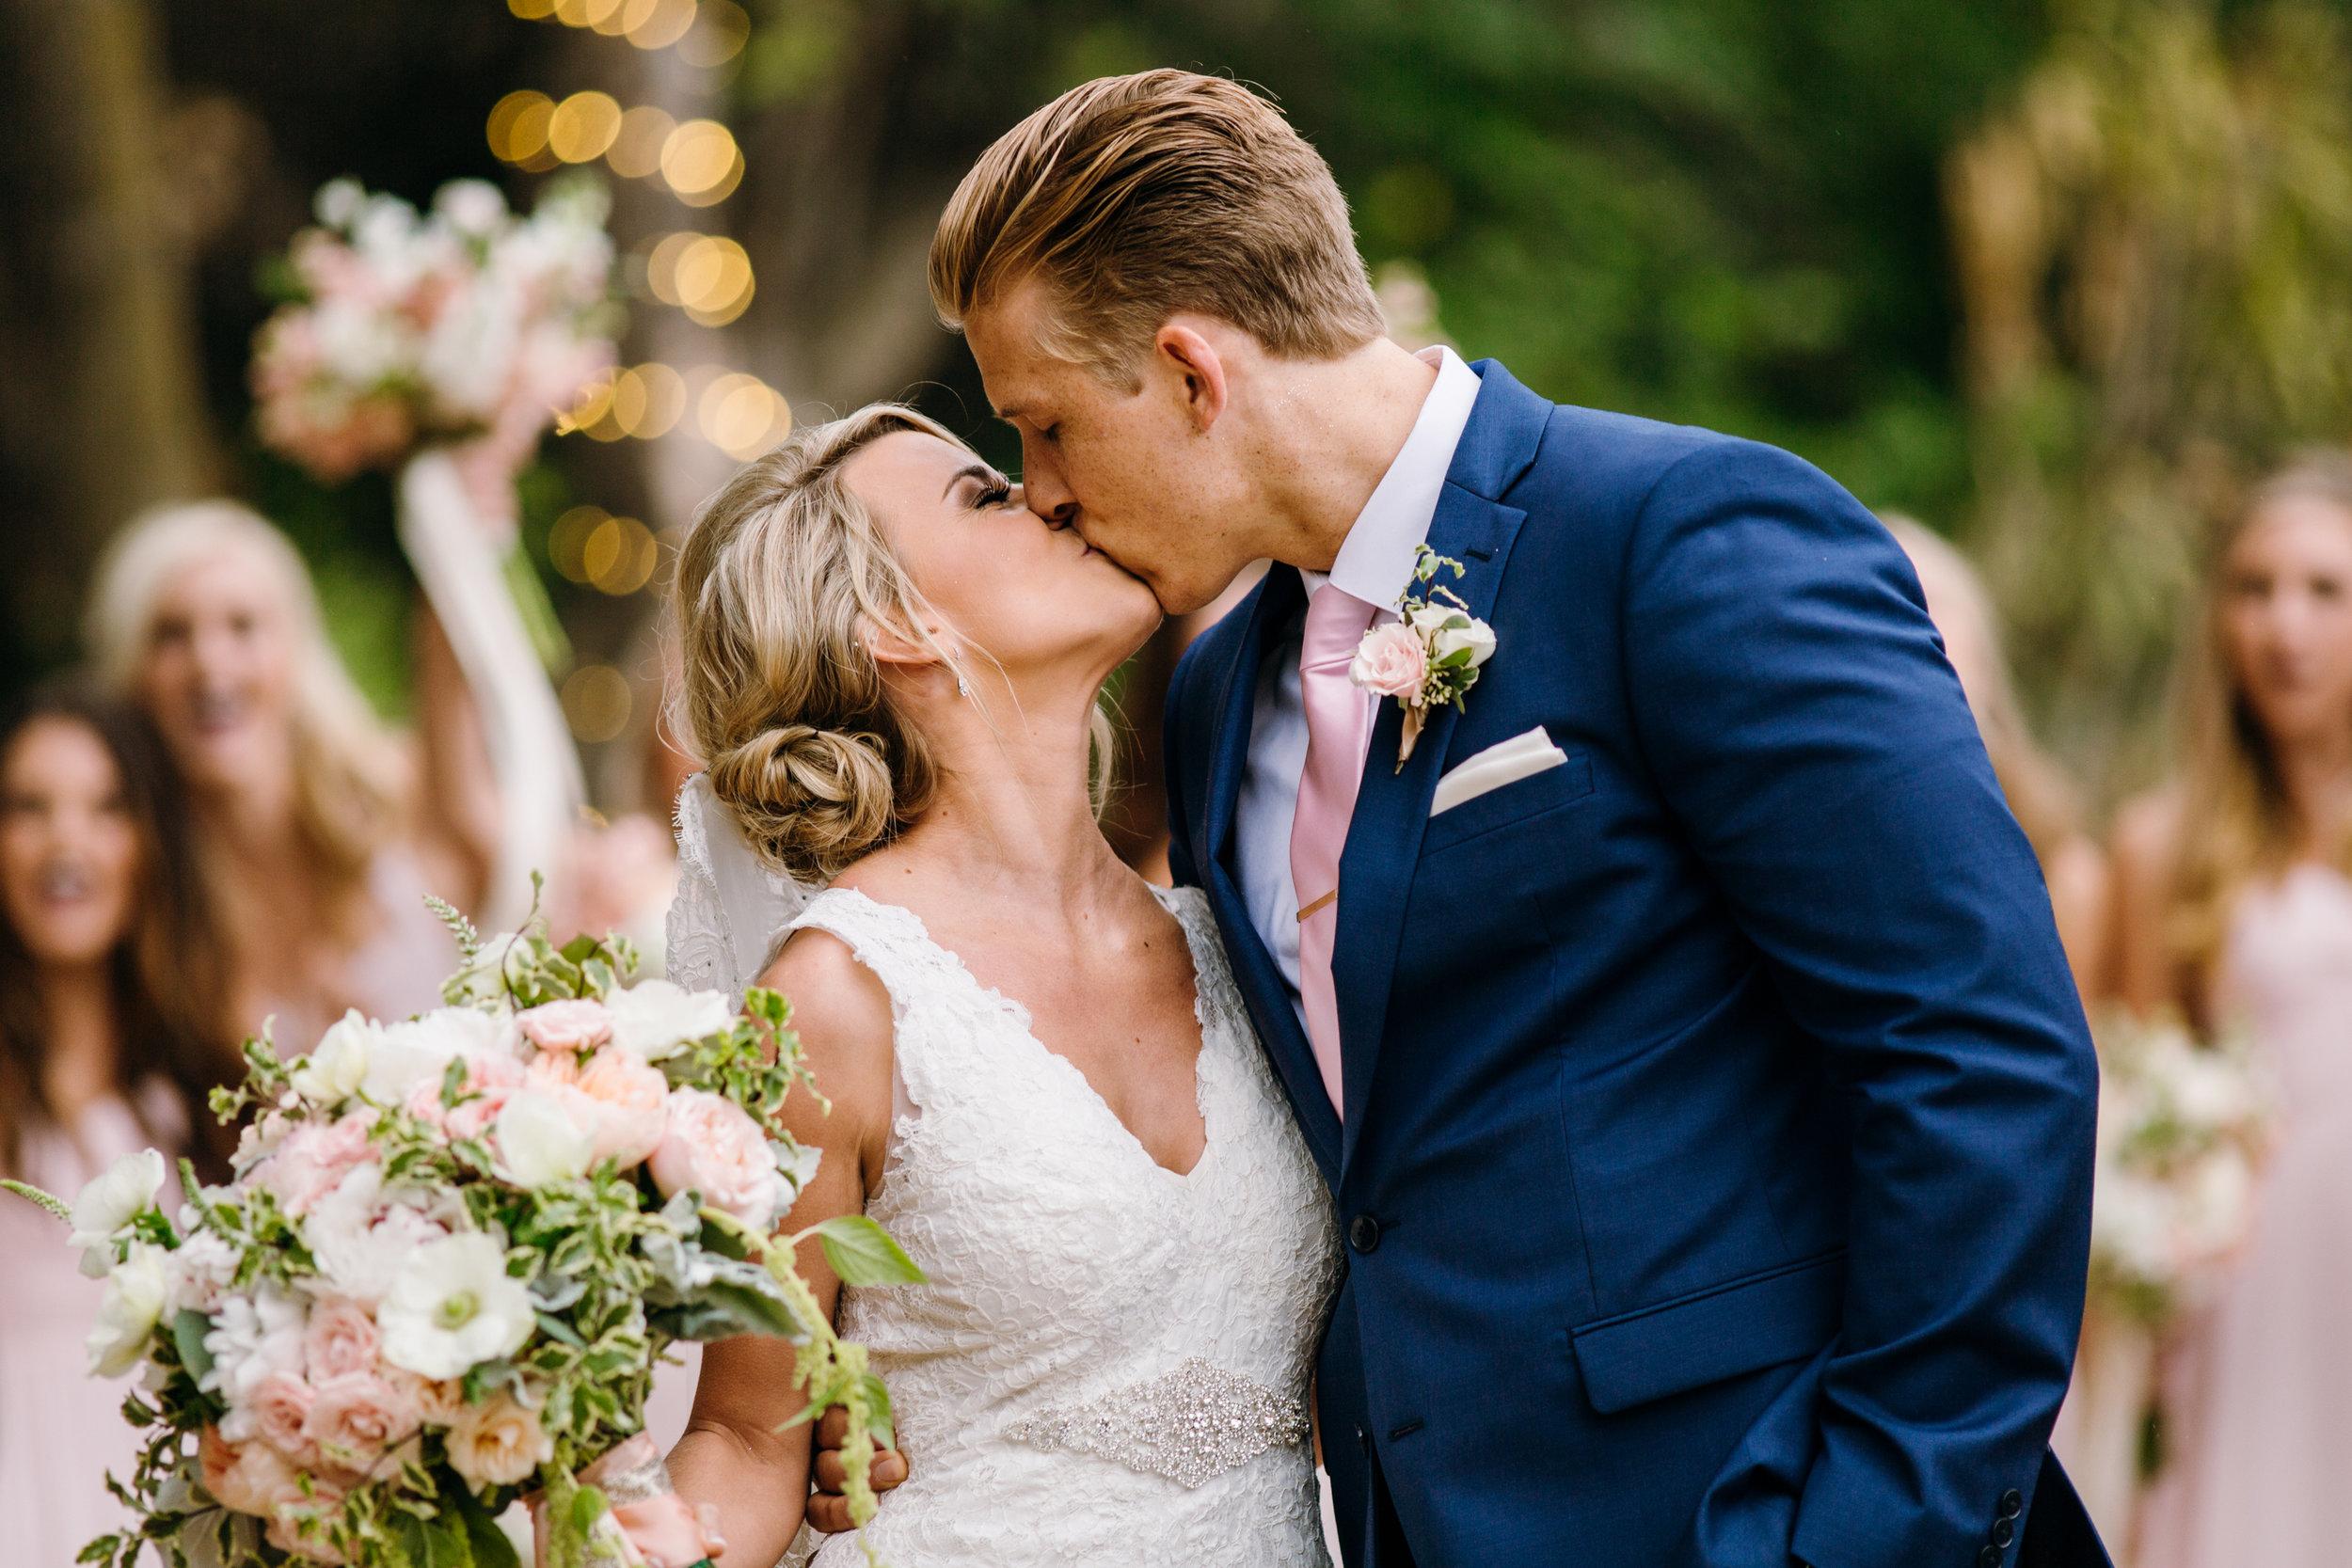 KaraNixonWeddings-LakeOakMeadows-Temecula-Wedding-1.jpg